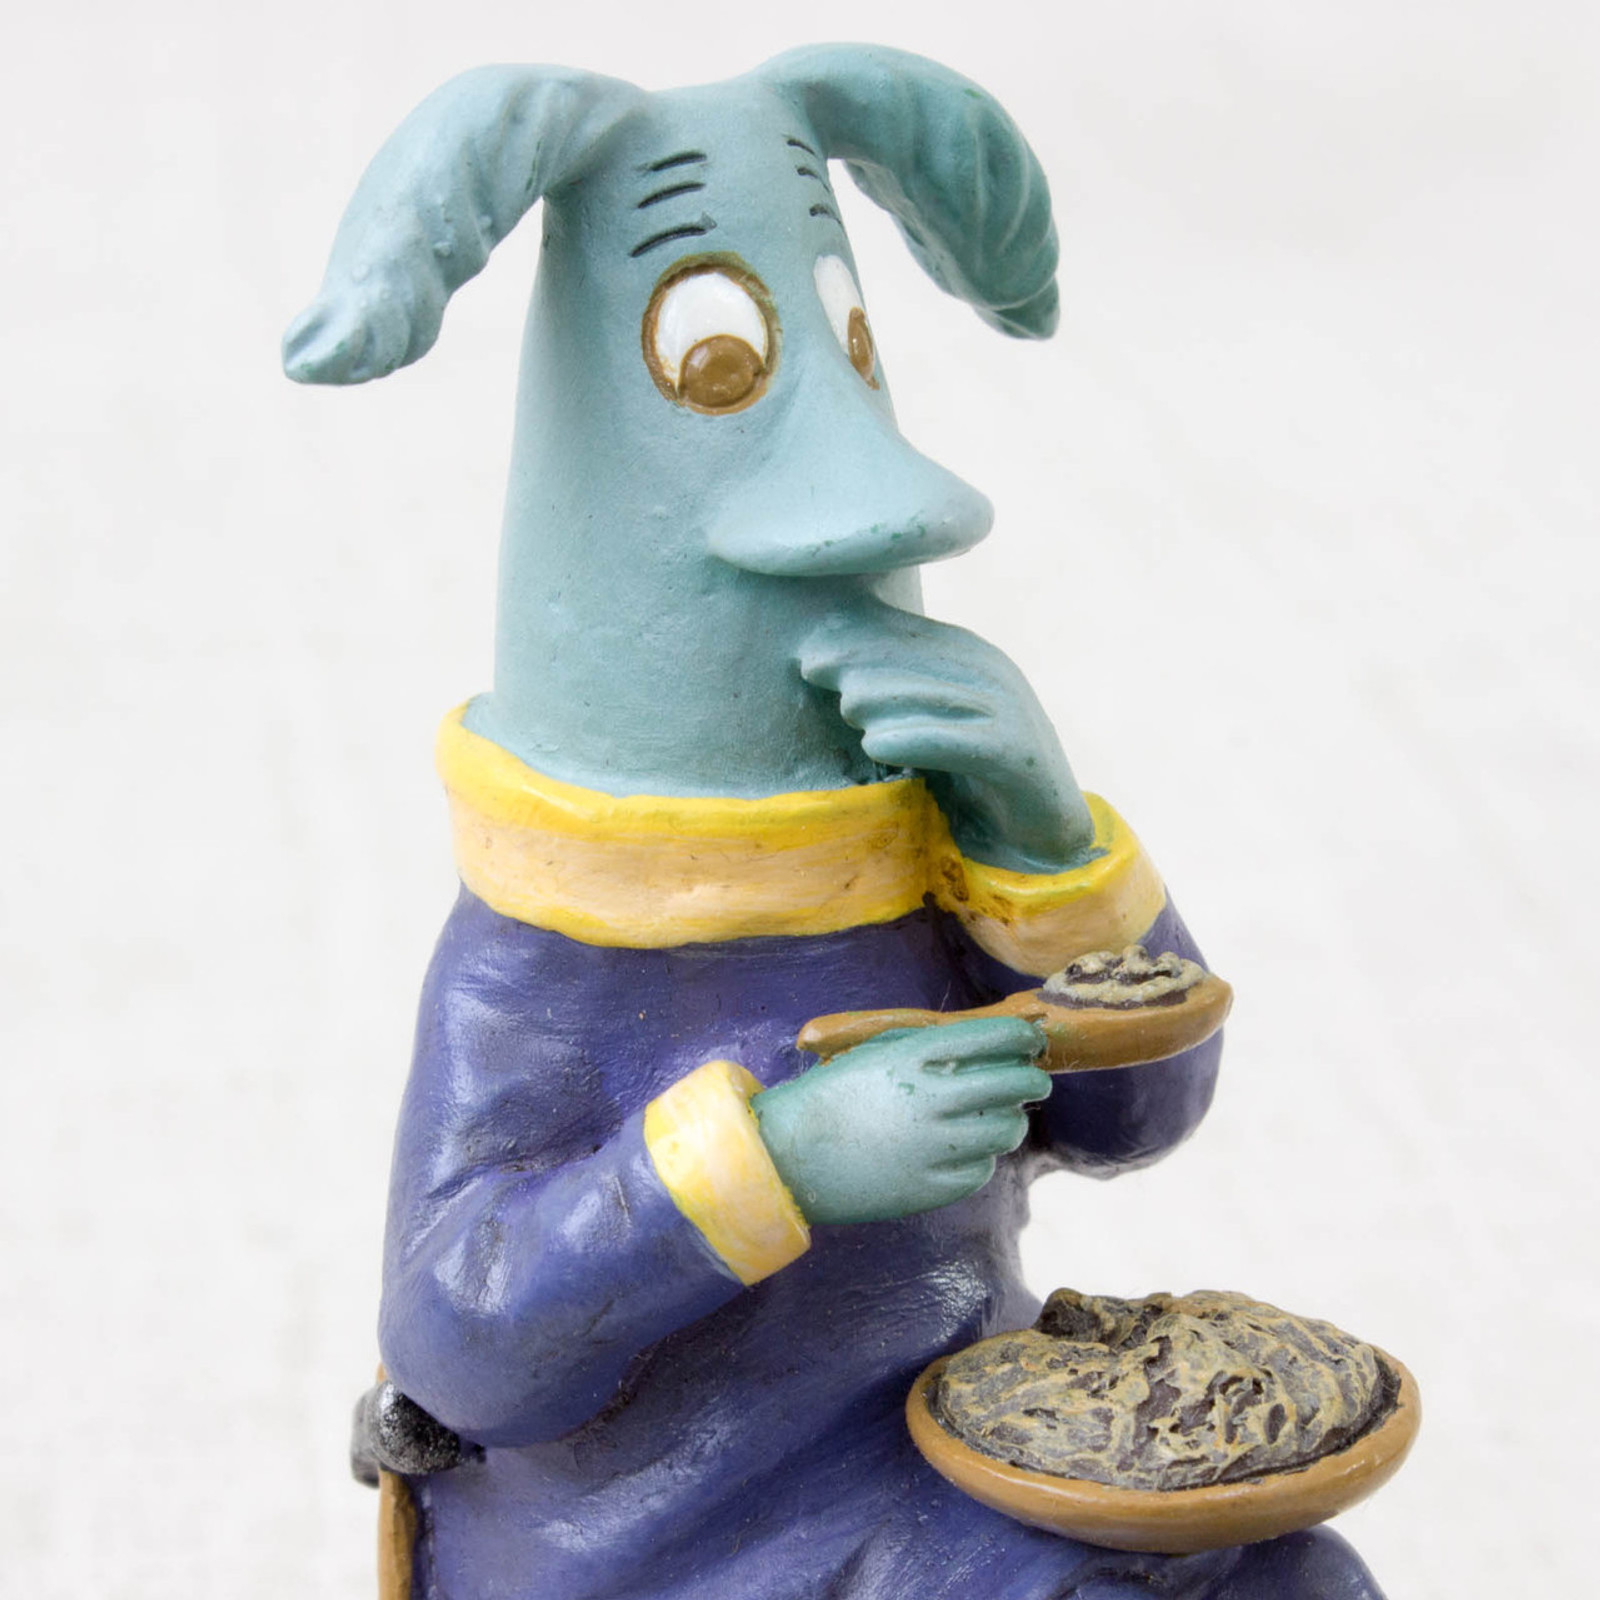 RARE! Moomin Characters Fredrikson Original Comics Ver. Mini Figure Benelic